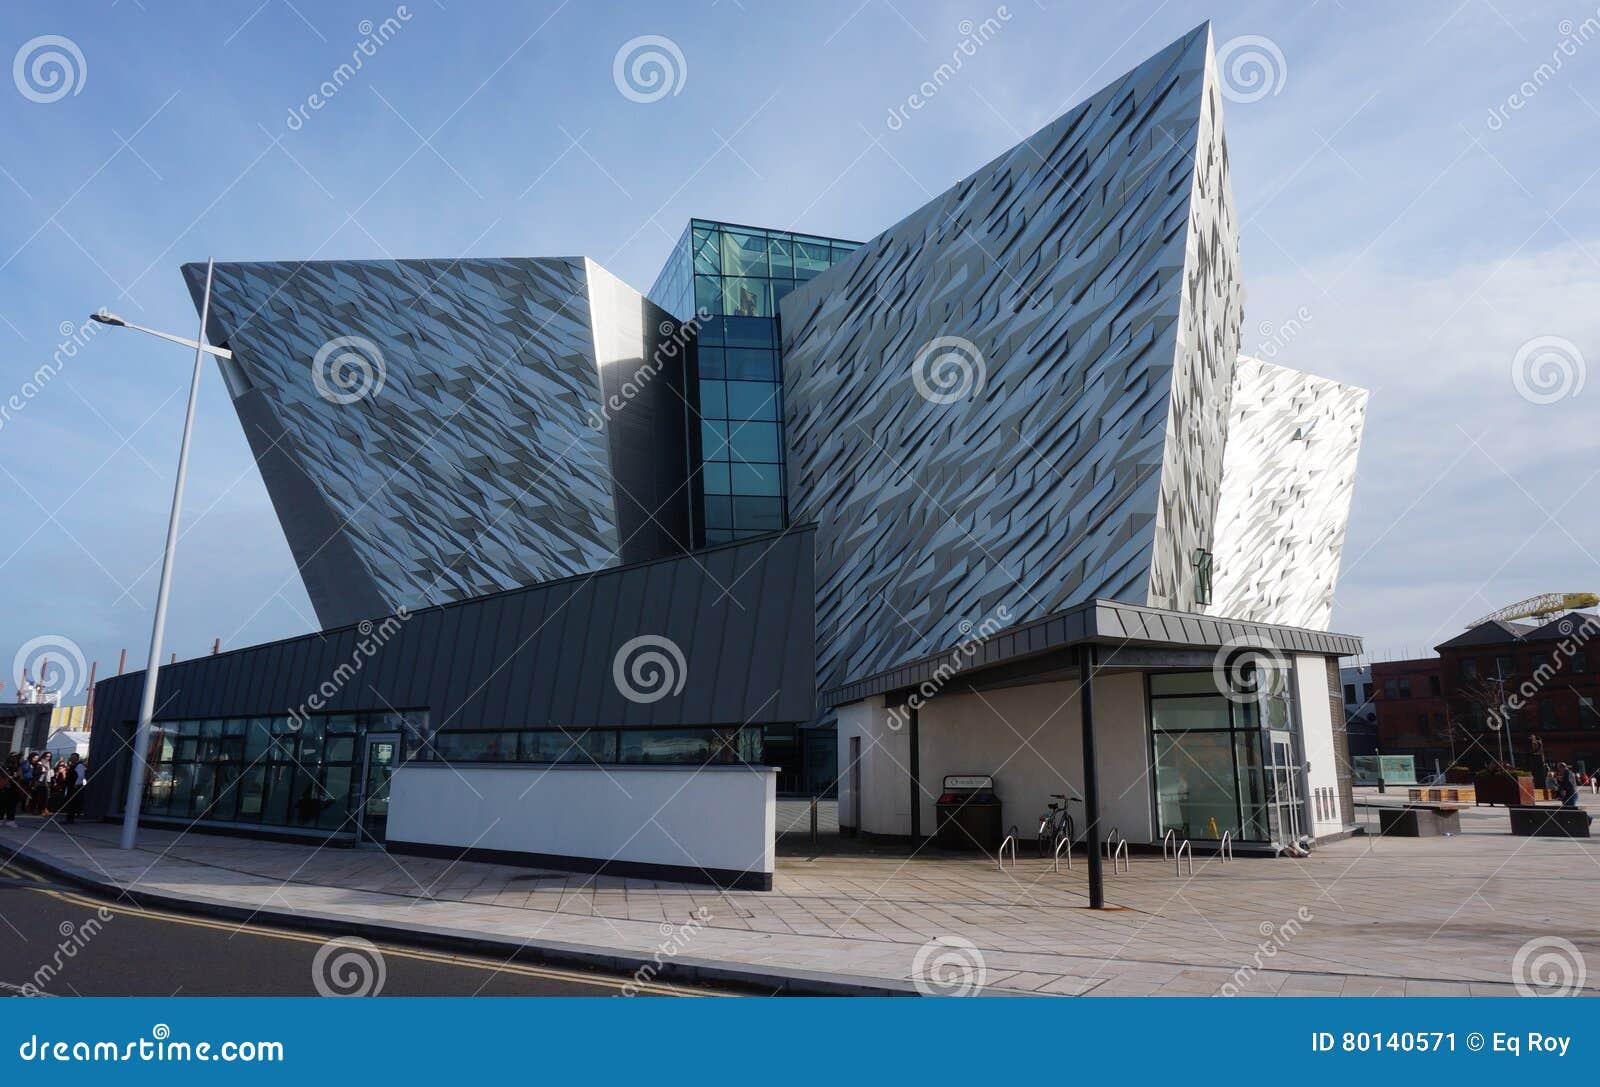 The Titanic Experience Museum in Belfast, Northern Ireland